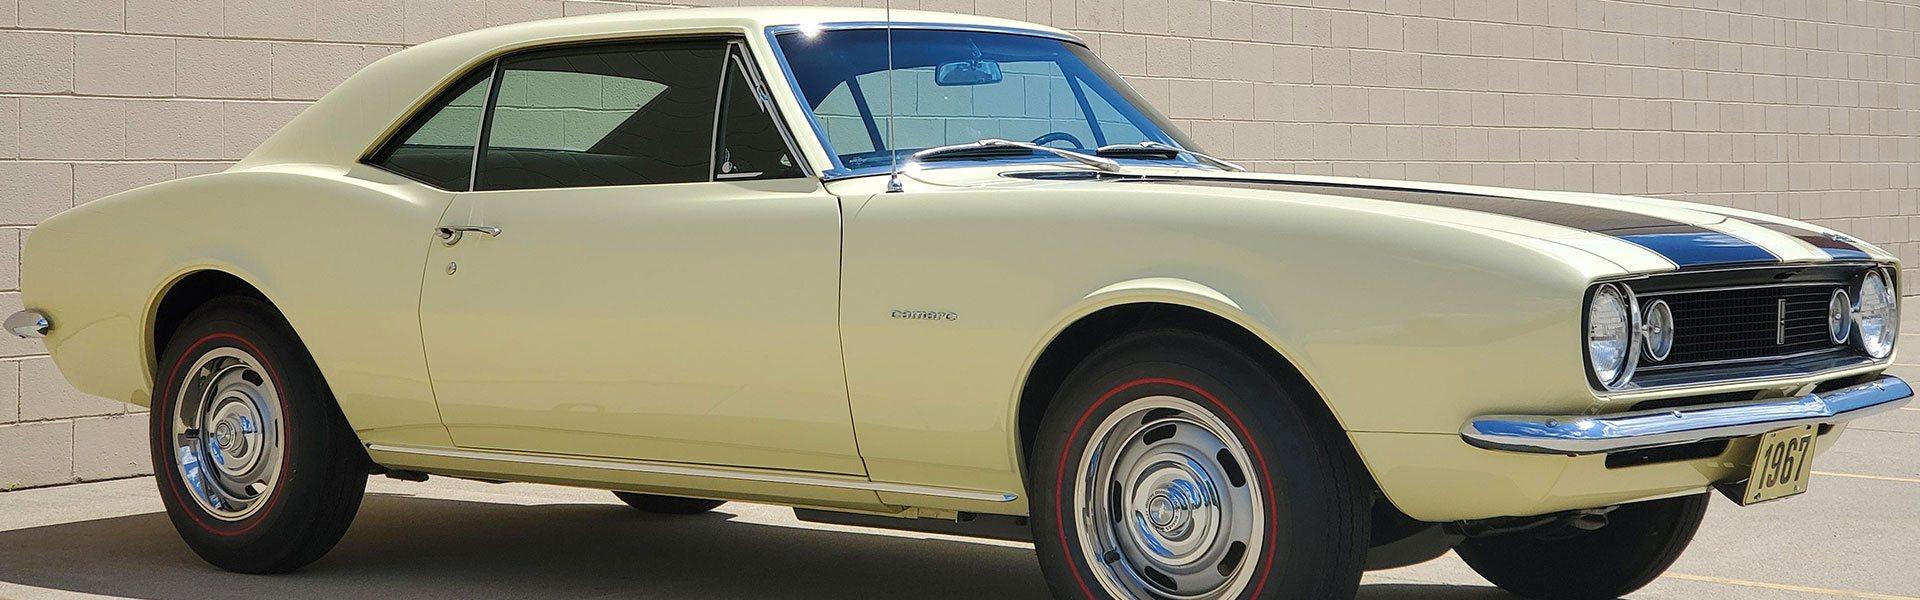 1967 Camaro Z/28 Butternut Yellow